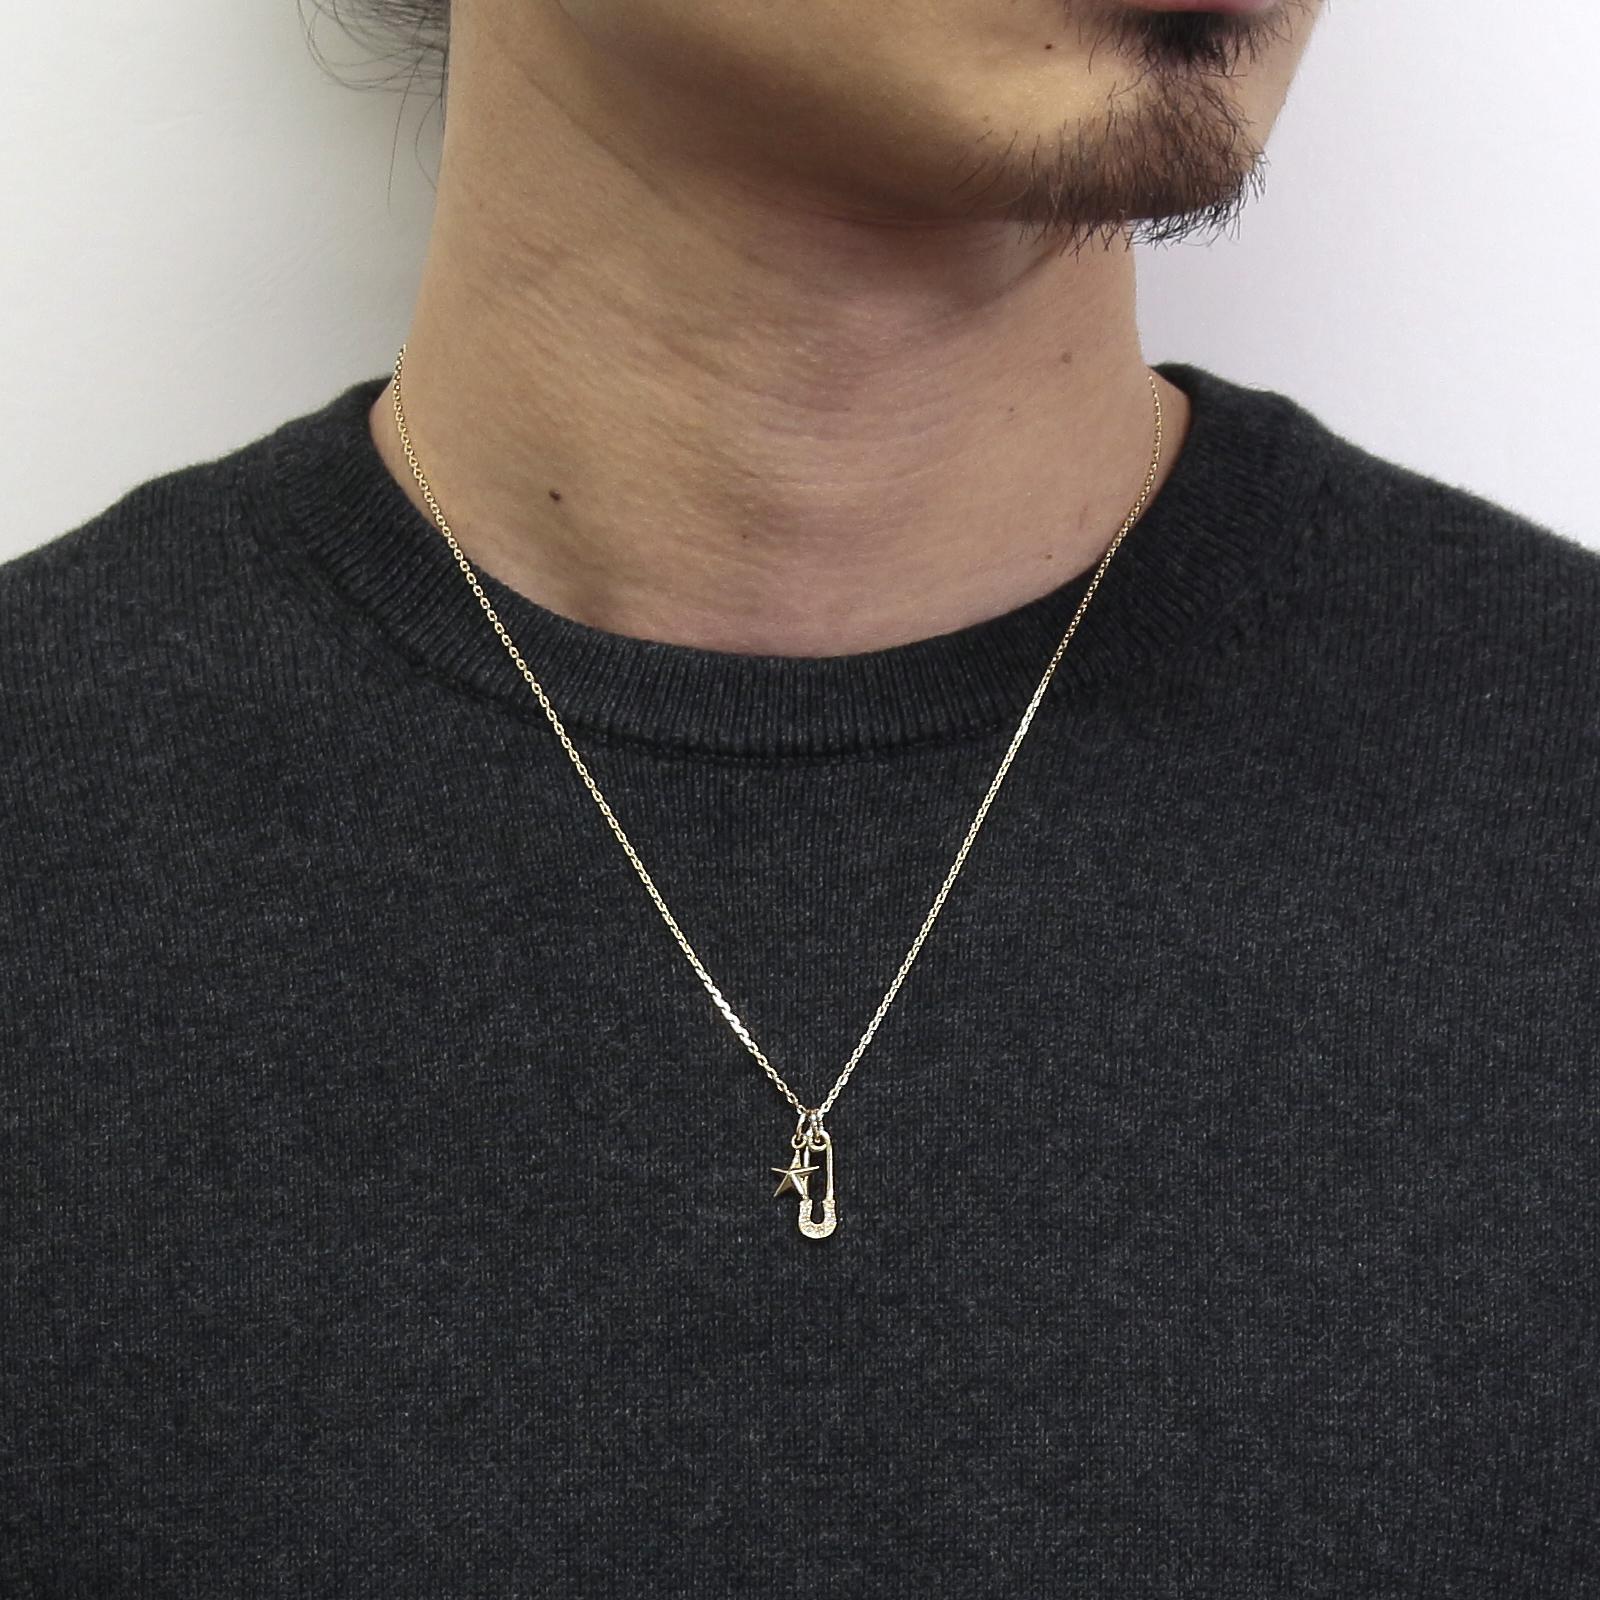 Safety Pin Charm + Small Star Charm - K18Yellow Gold w/Diamond Set Necklace